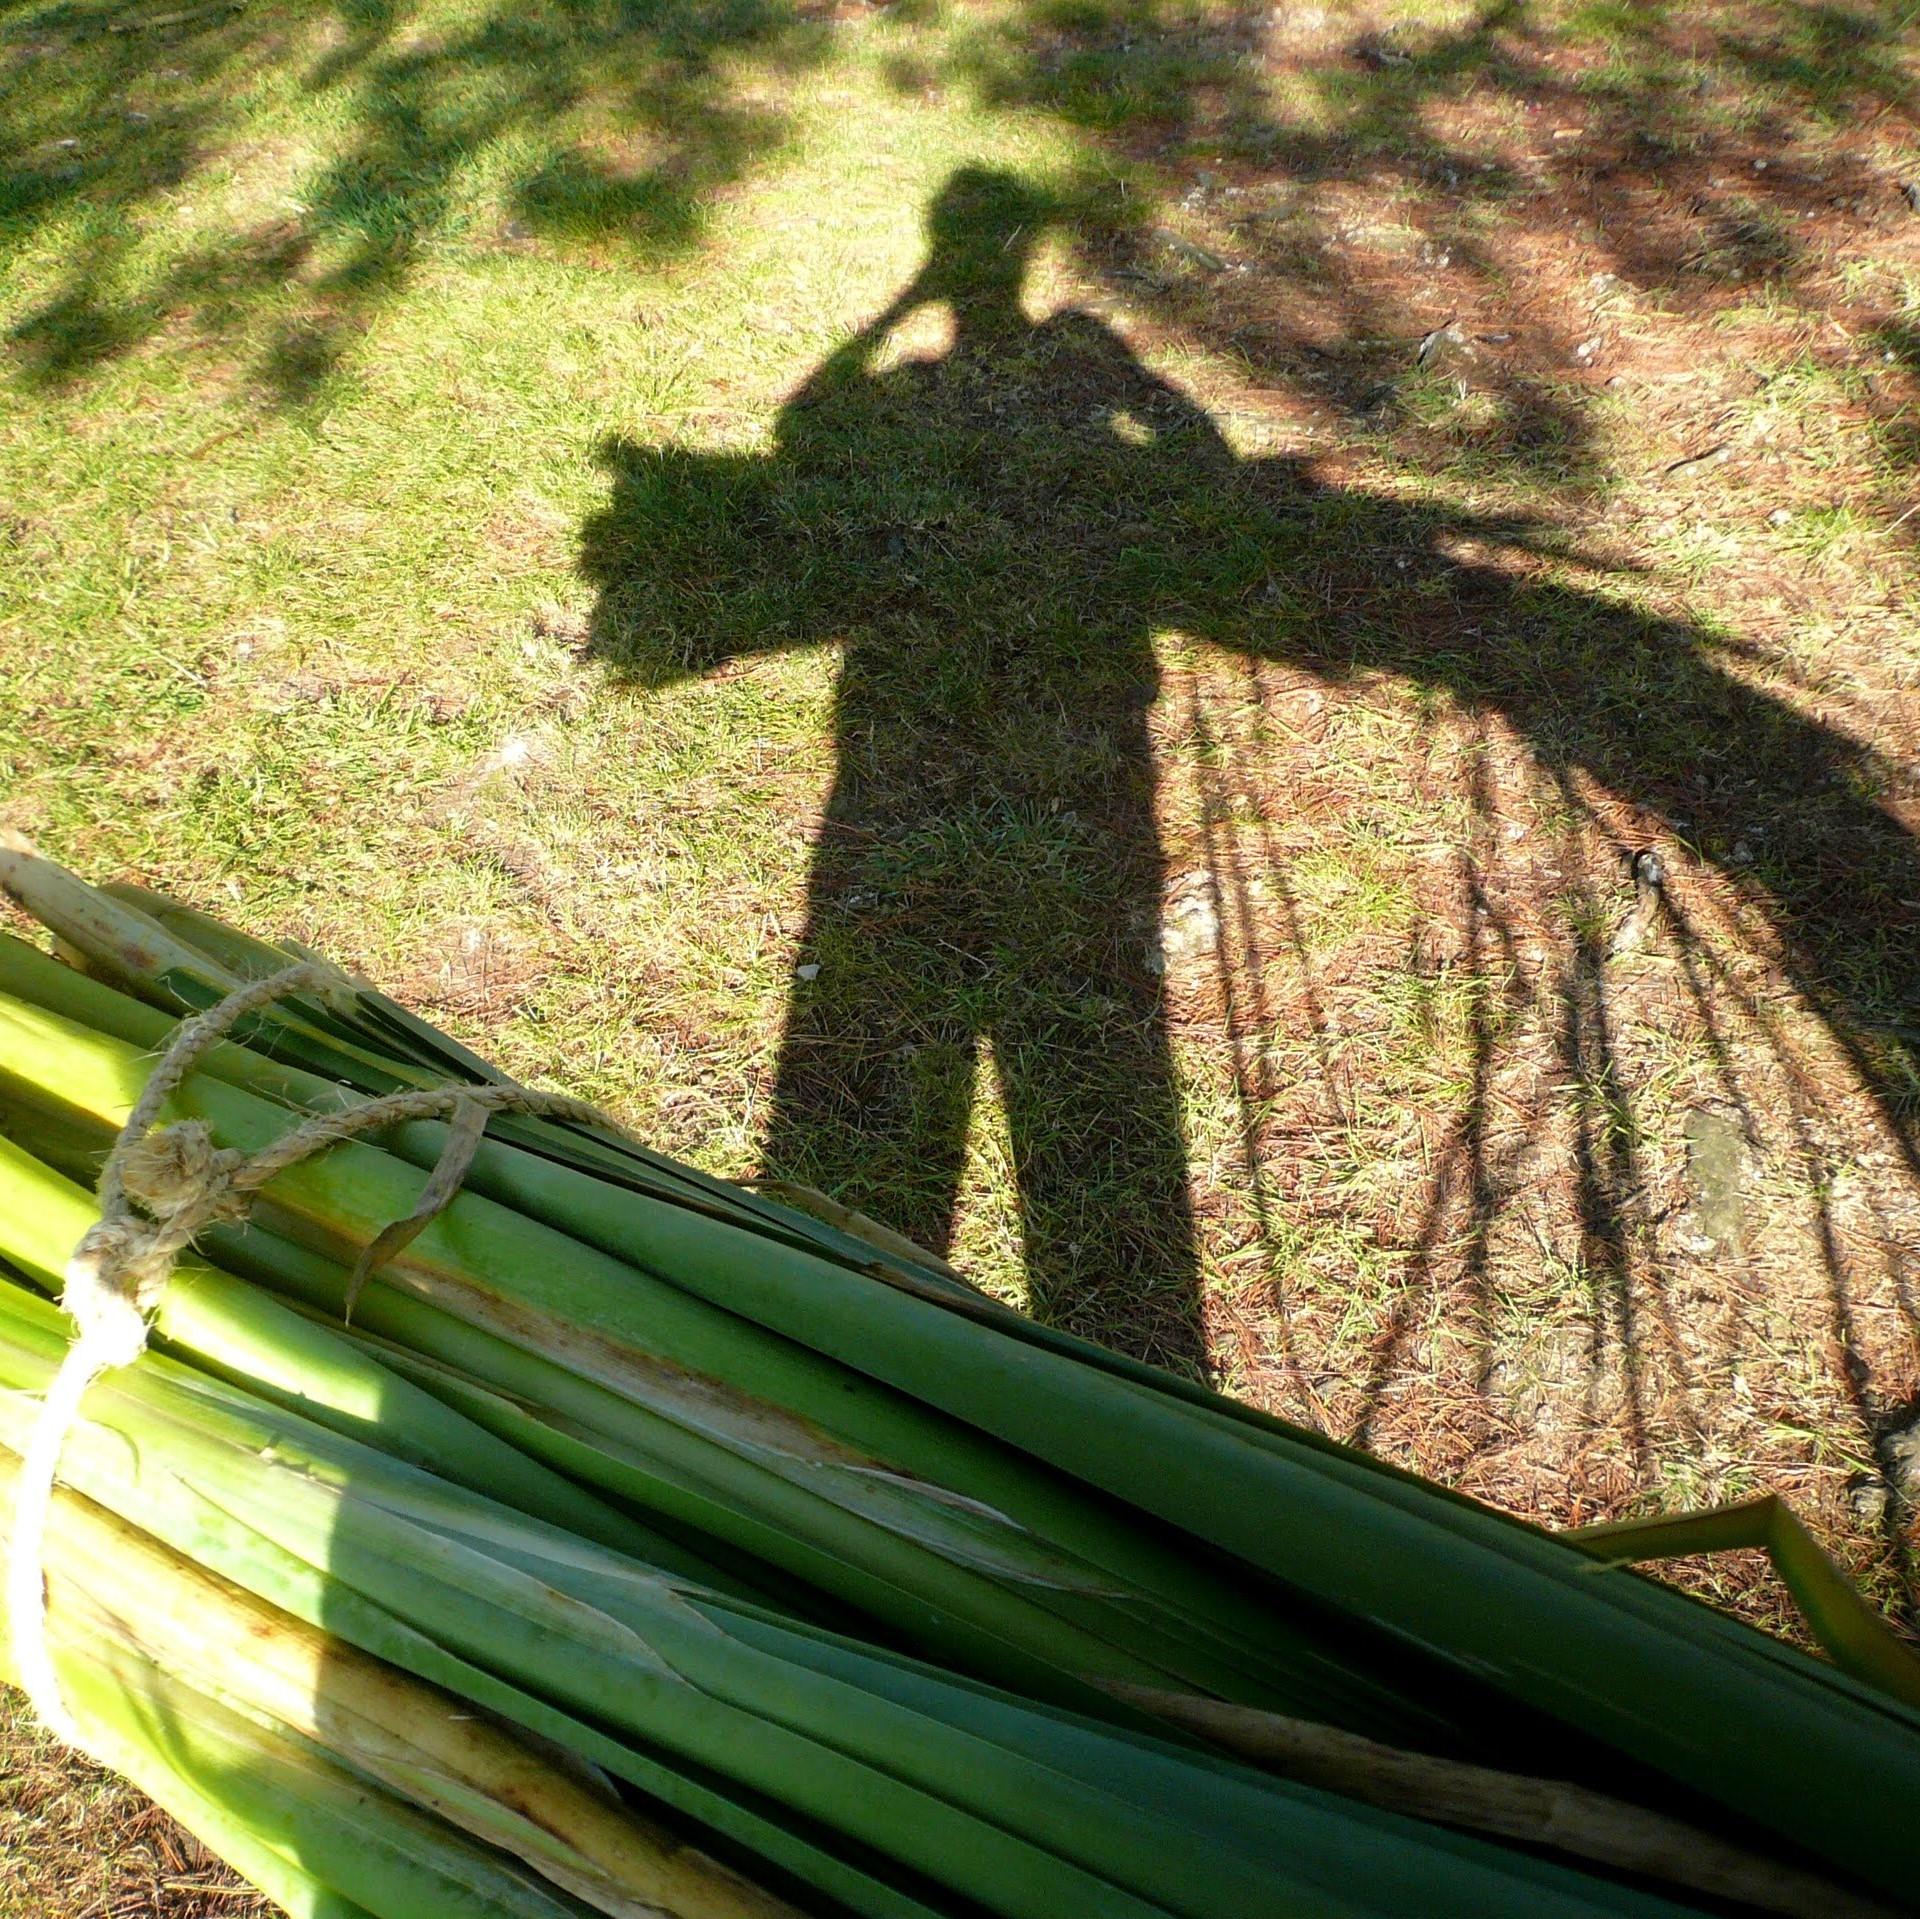 harvesting reed mace